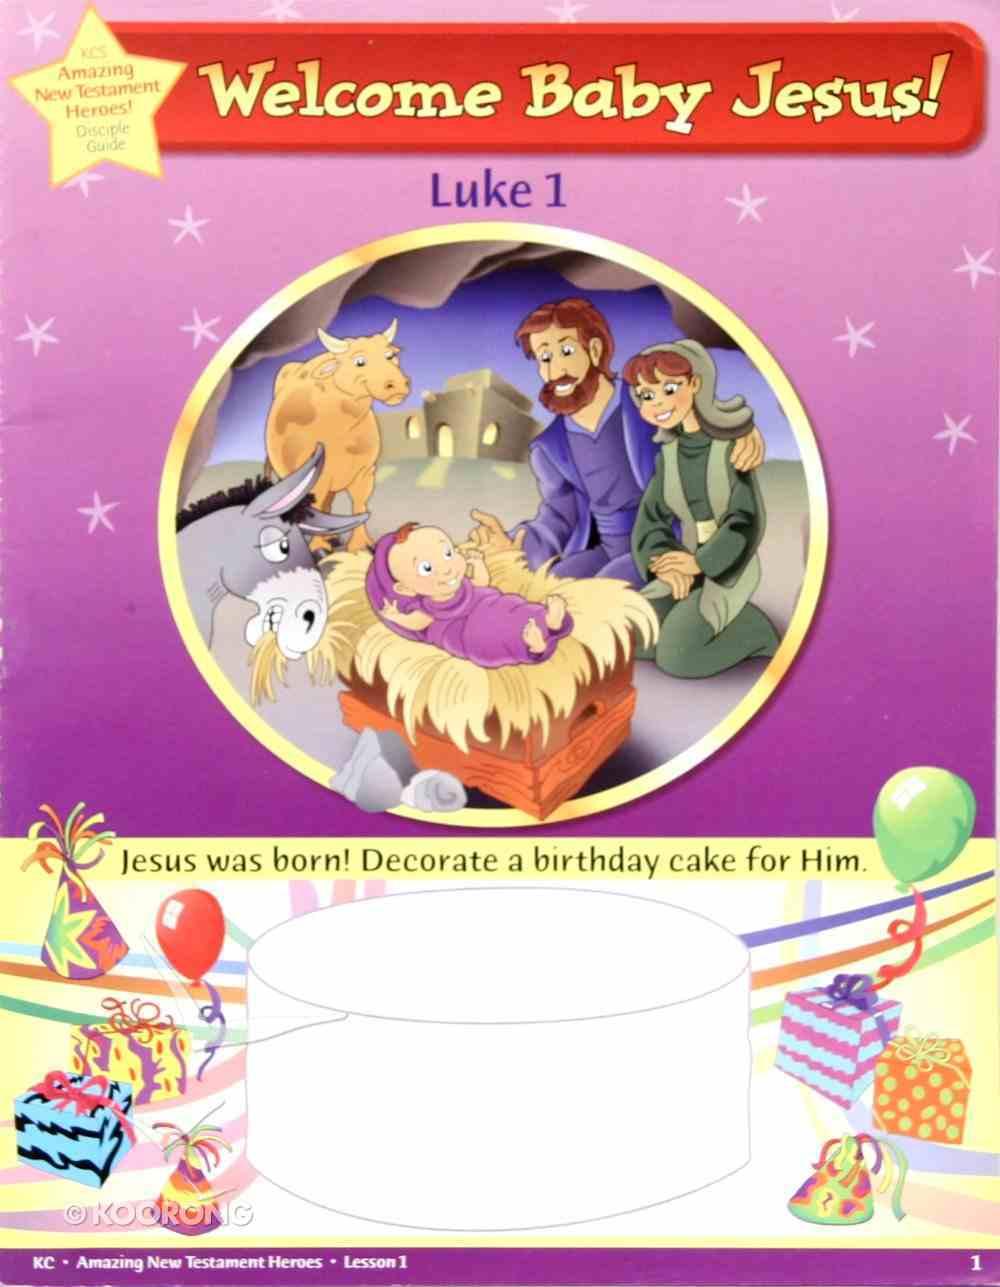 Dlc Kindergarten: Amazing N.T Heroes Ages 5-6 (Student) (Discipleland Kindergarten, Ages 5-6 Series) Paperback